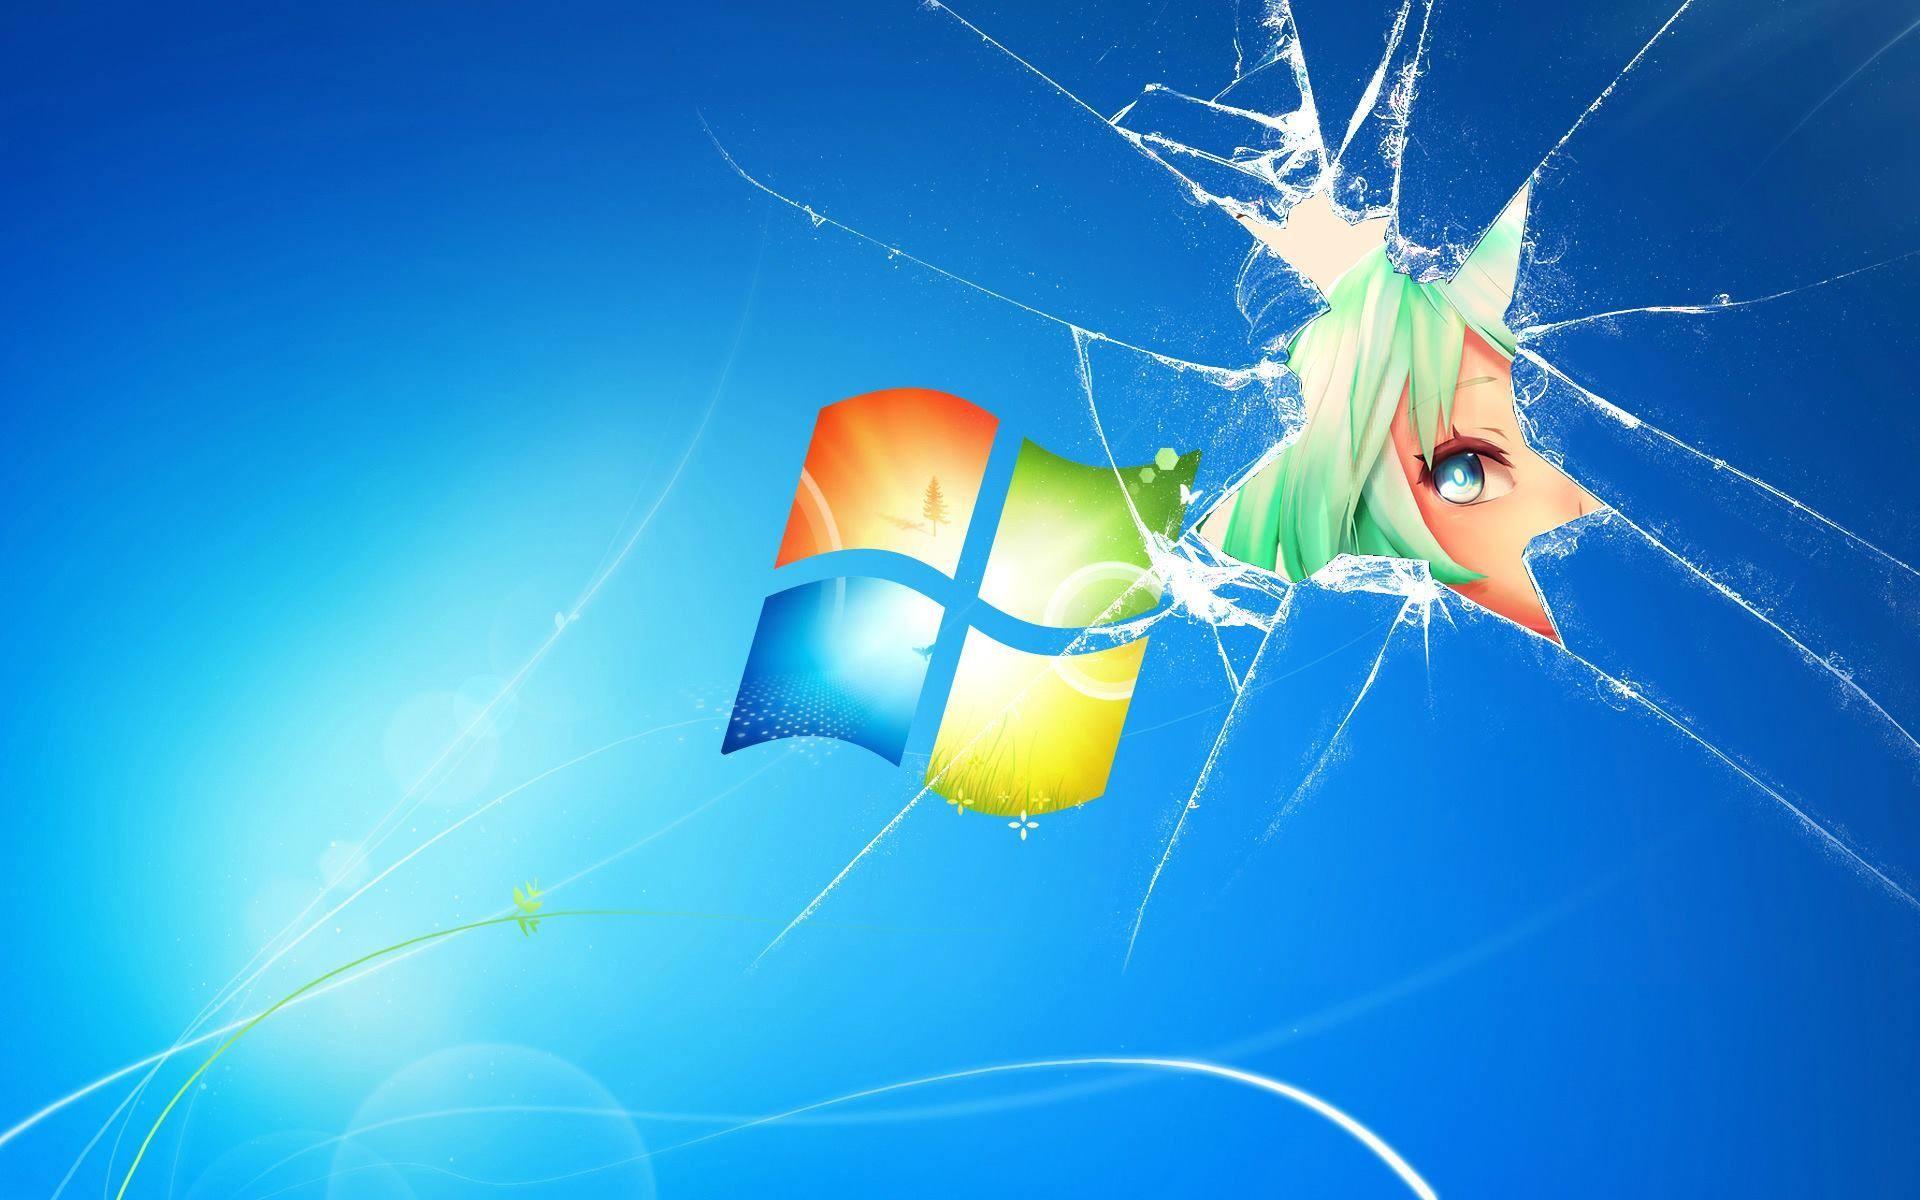 Aesthetic Laptop Lock Screen Wallpaper Hd